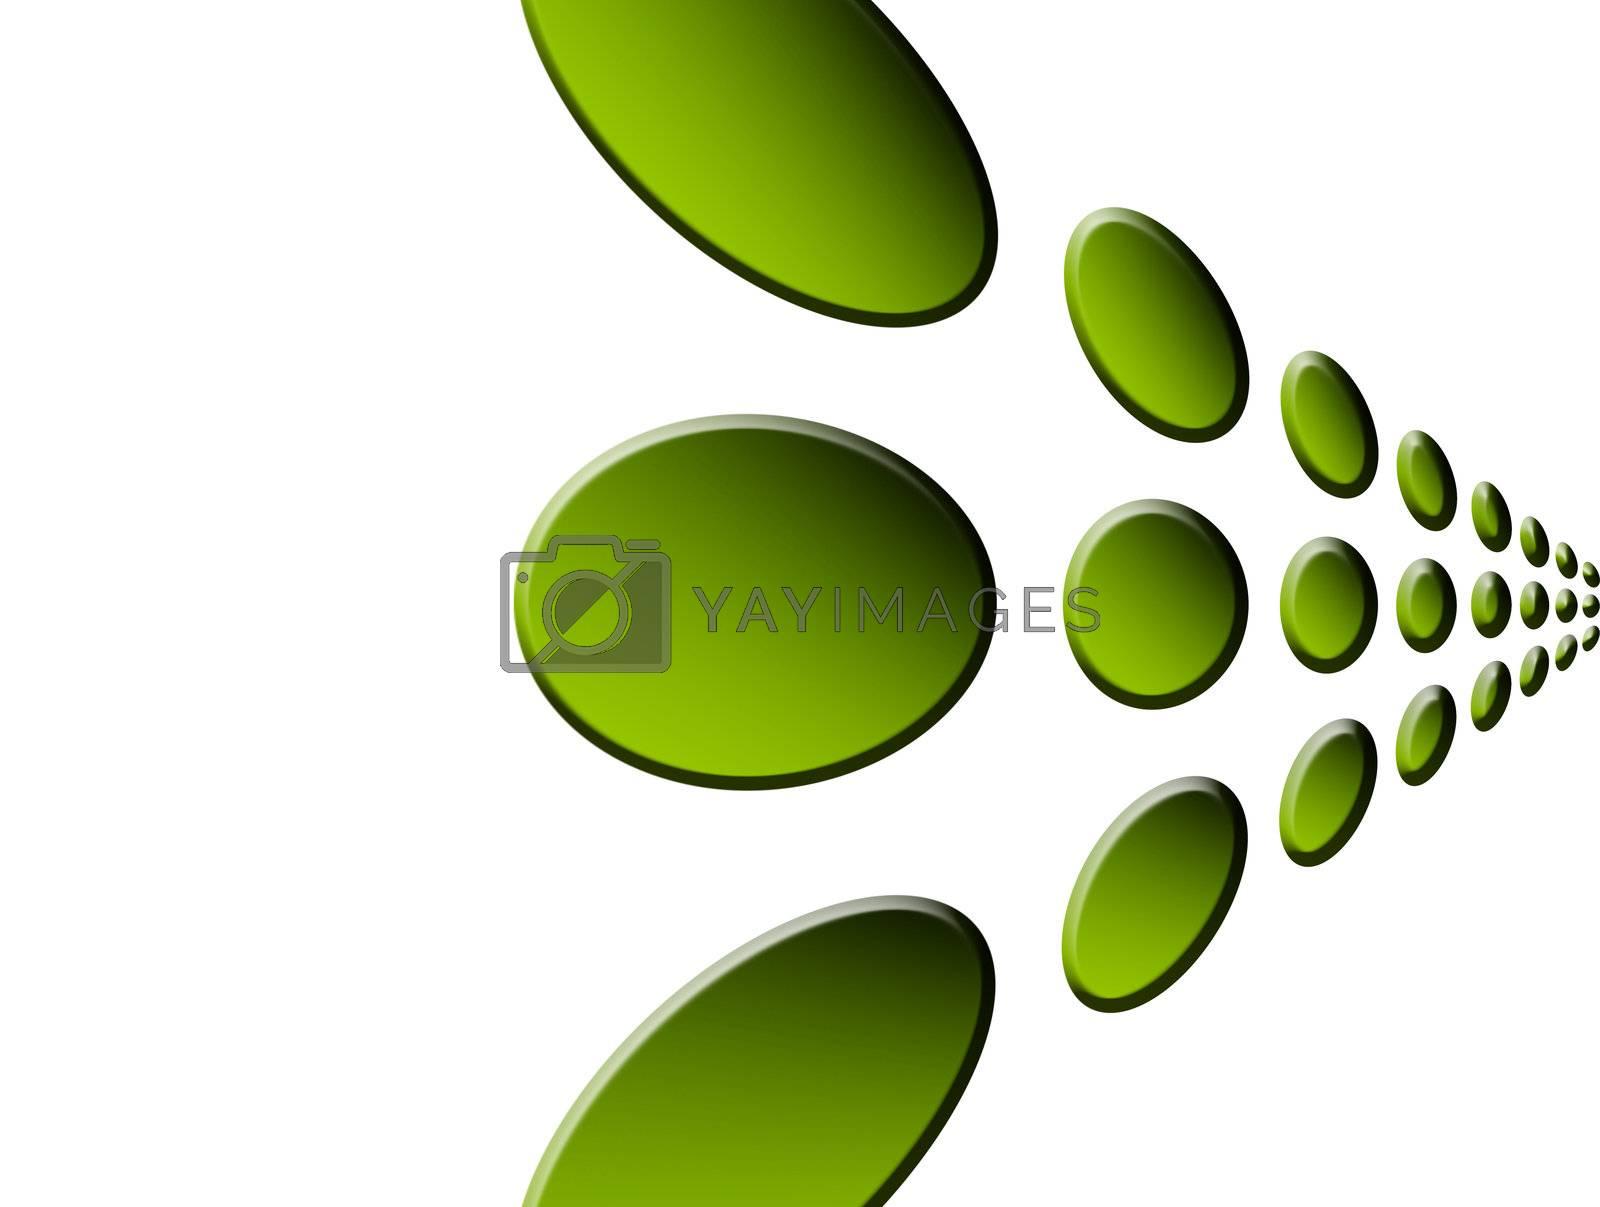 green points on white background, dynamic illustration